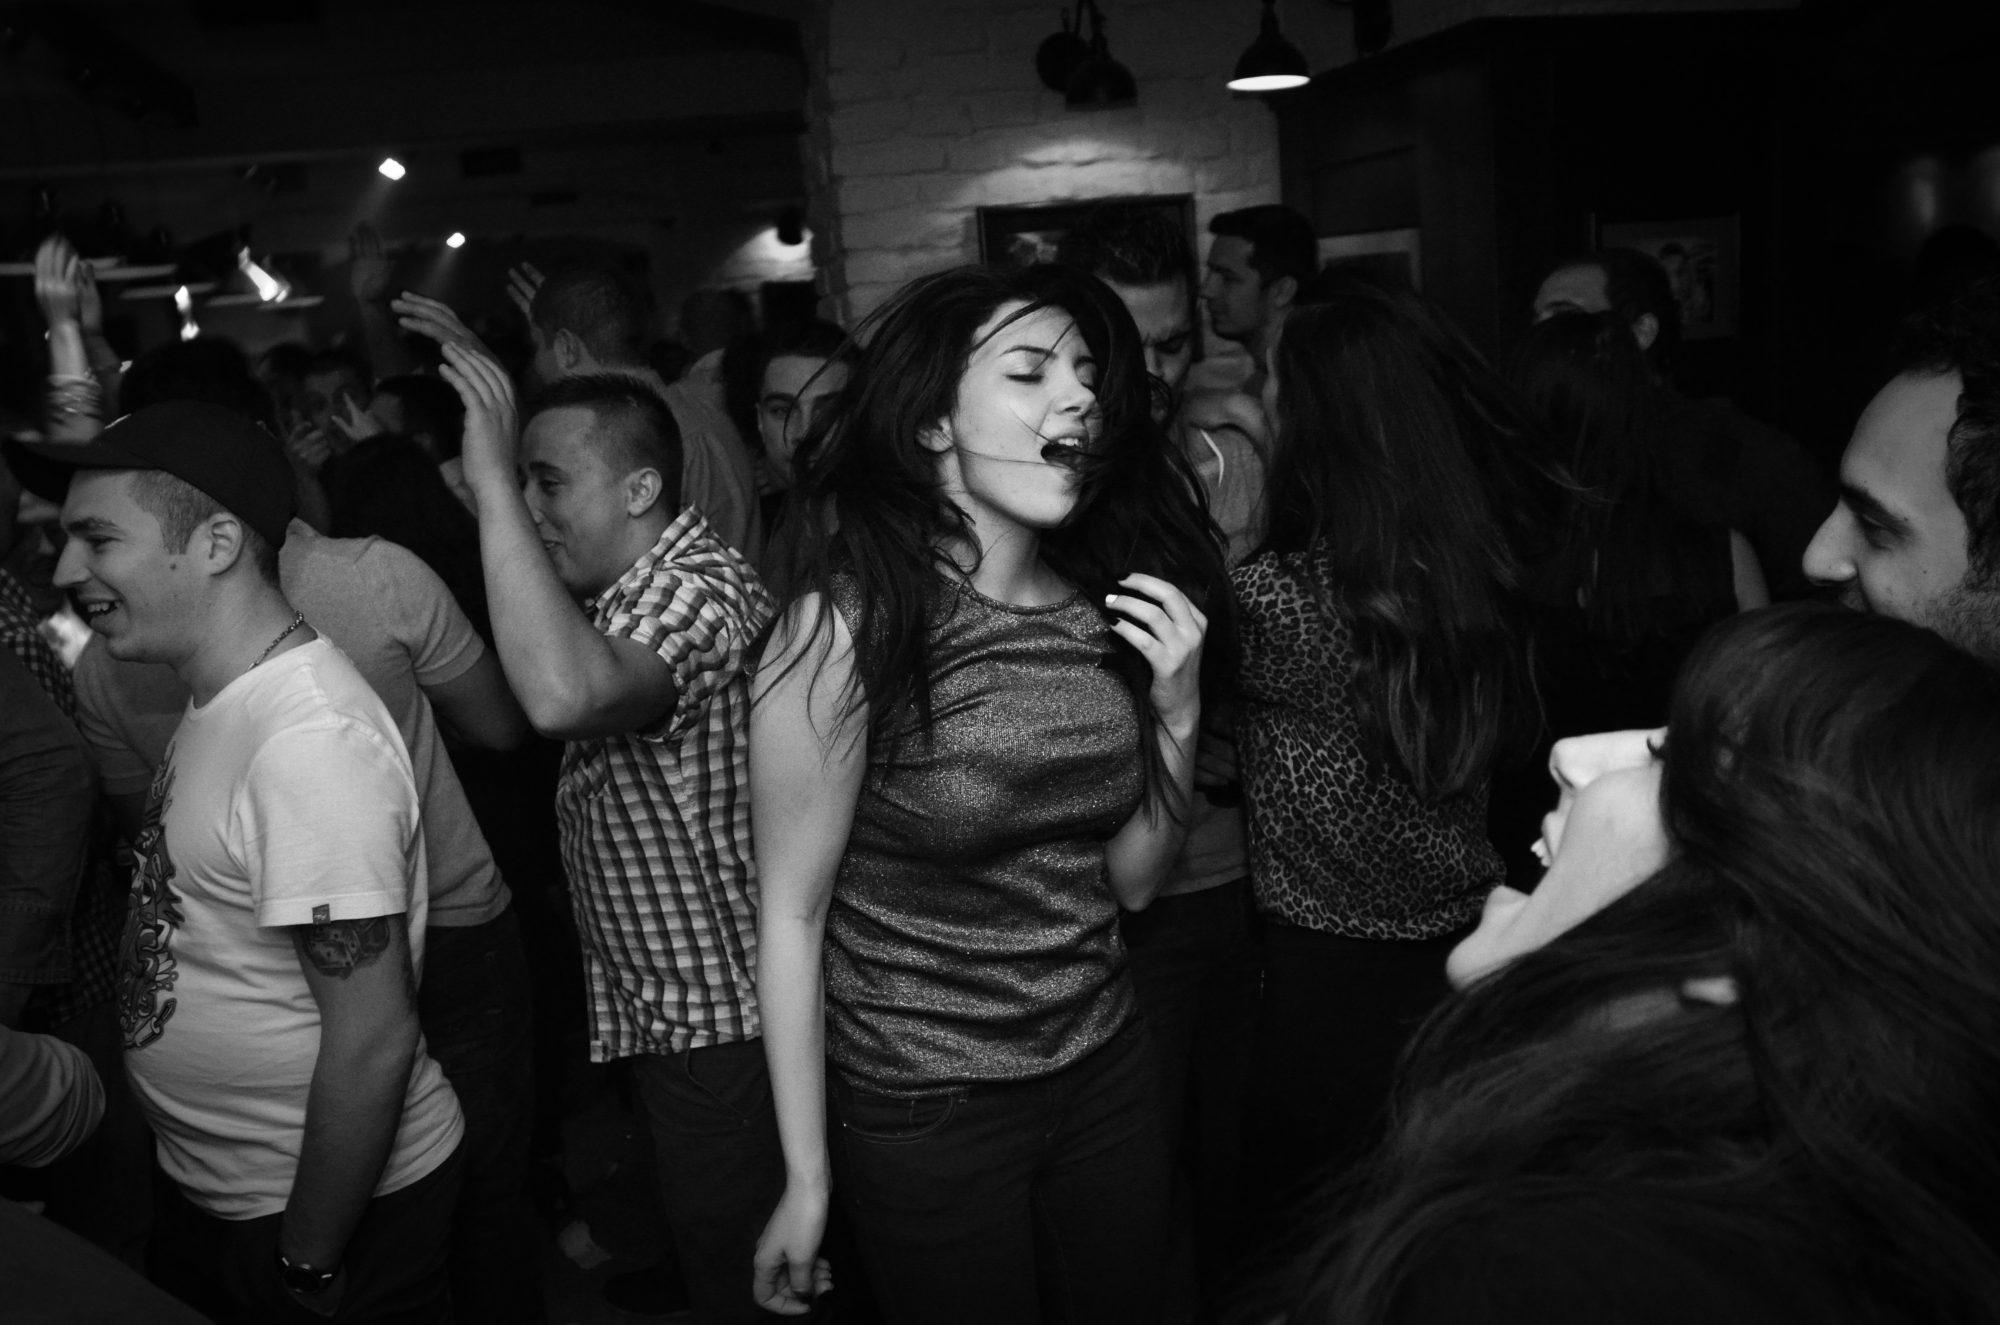 Cosmin-Cimil-Romanian-Photographer-Nightclub-Project-